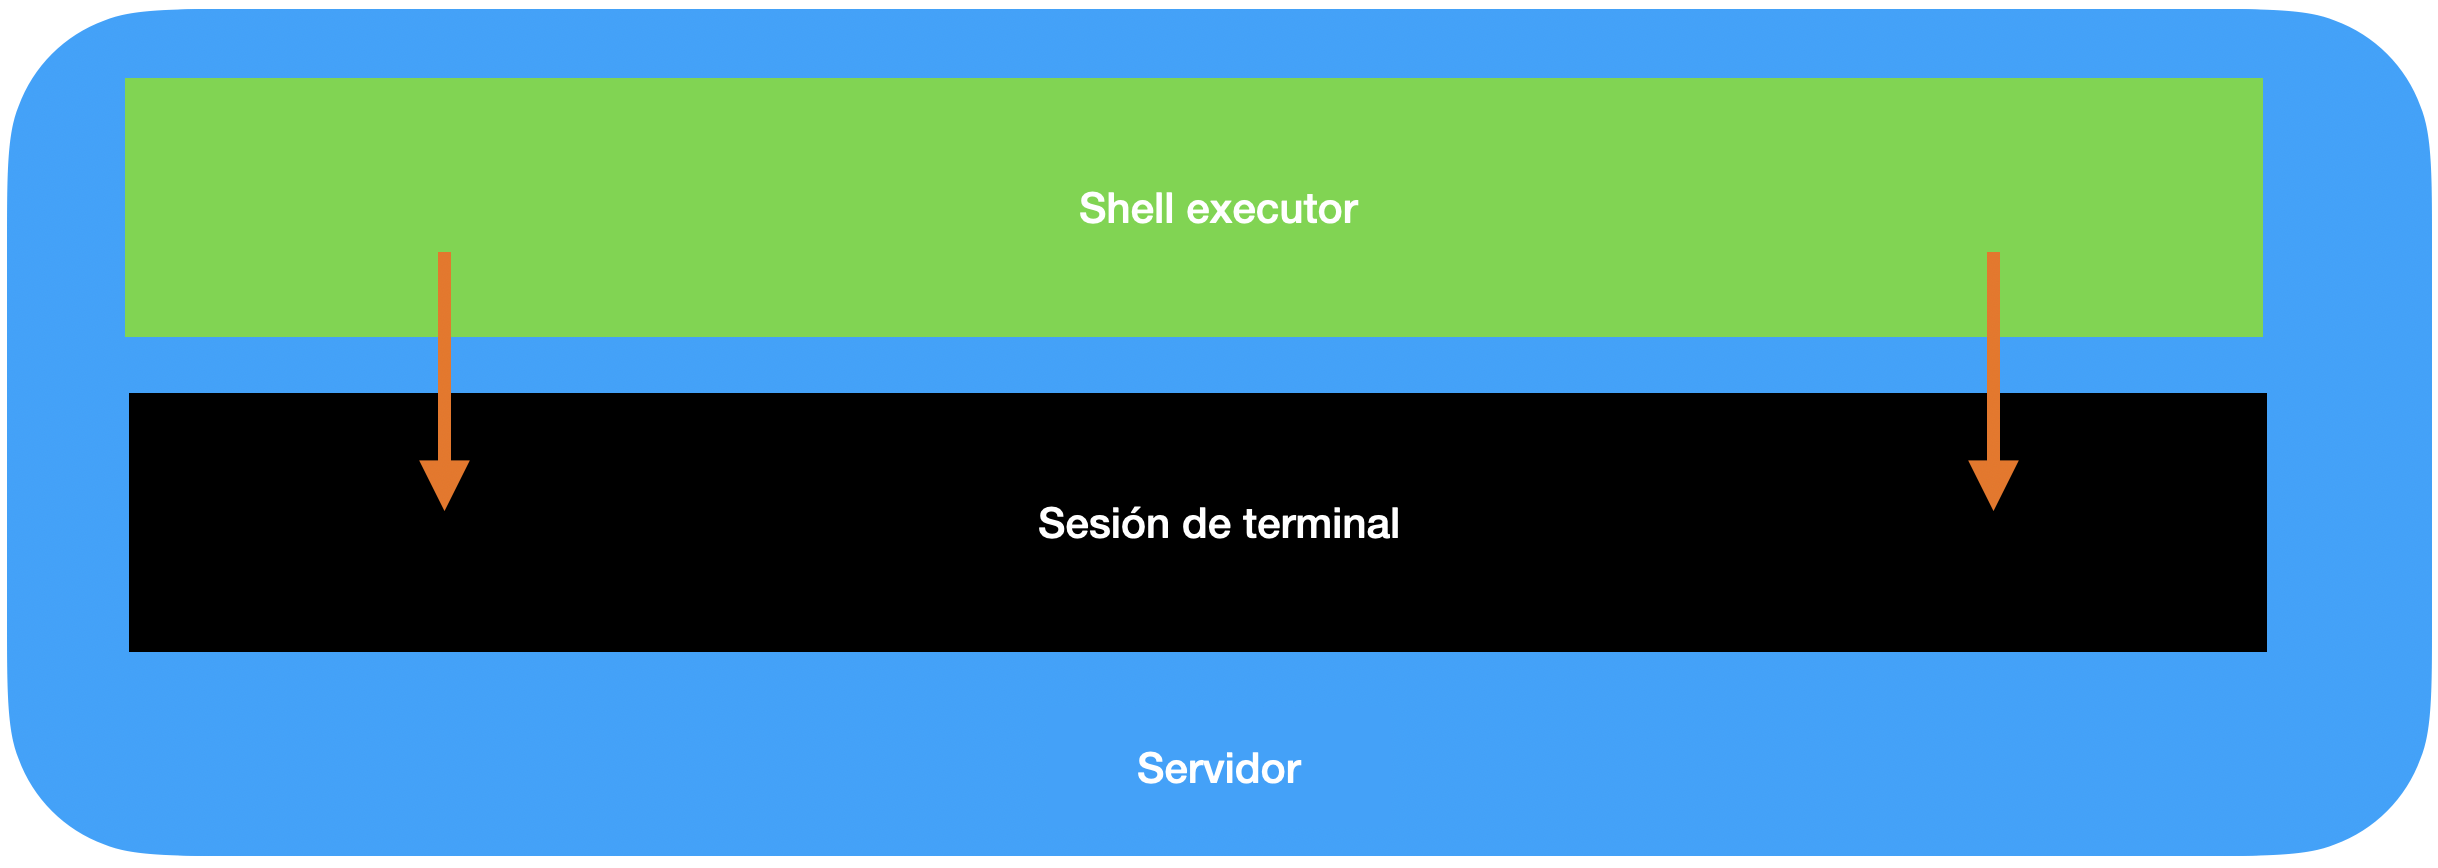 Imagen explicativa por capas: shell excutor se ejecuta sobre sesión de terminal del servidor